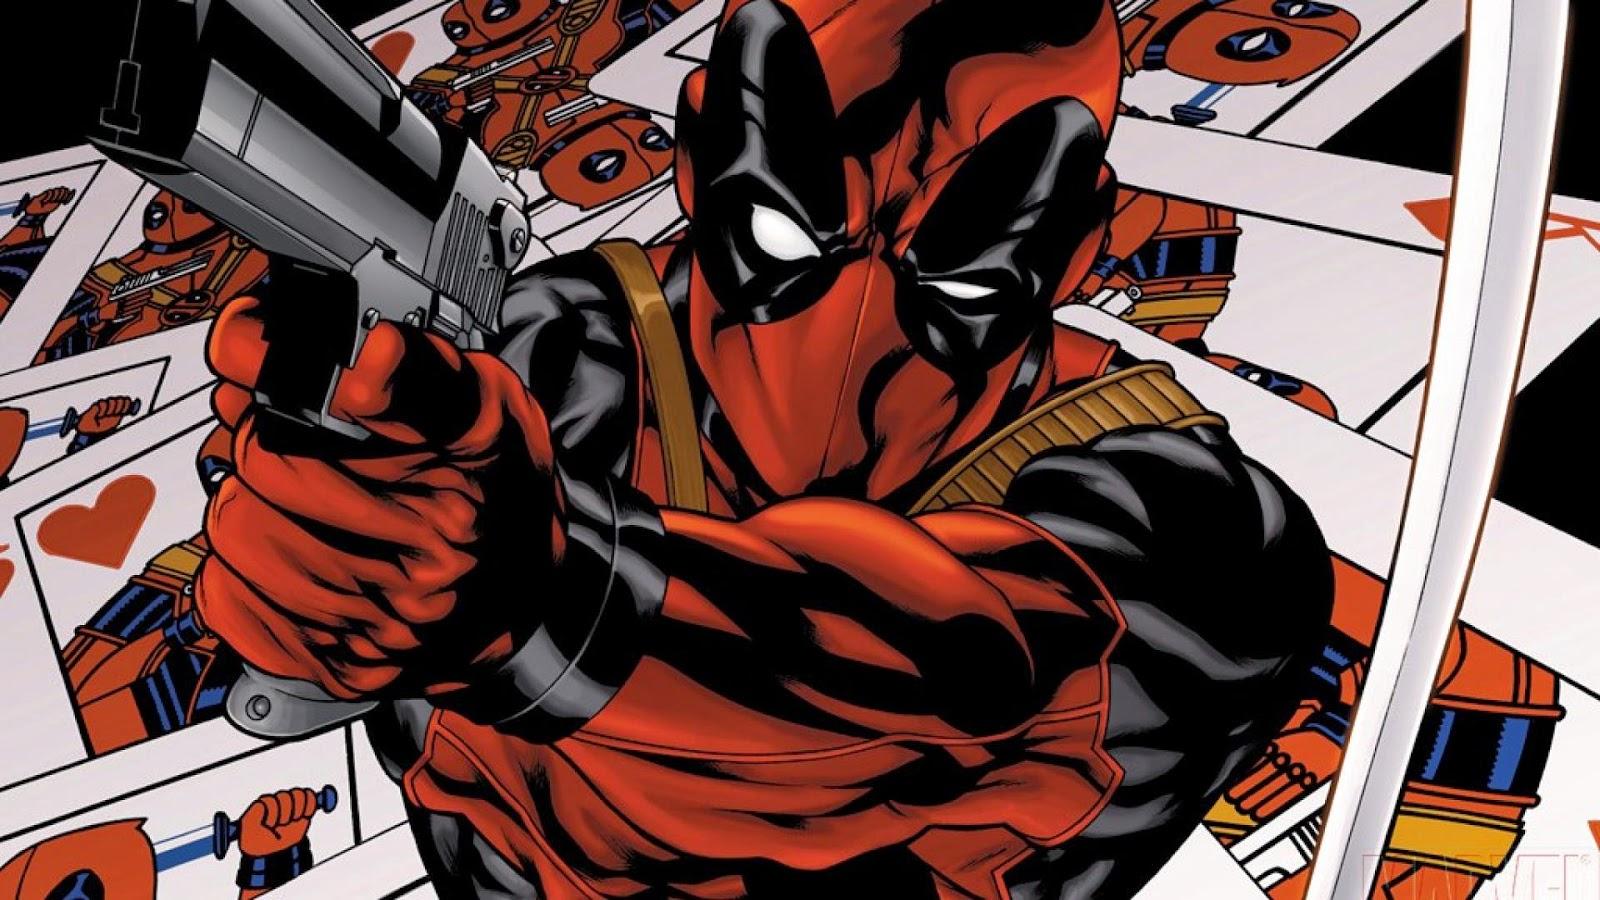 6. Deadpool